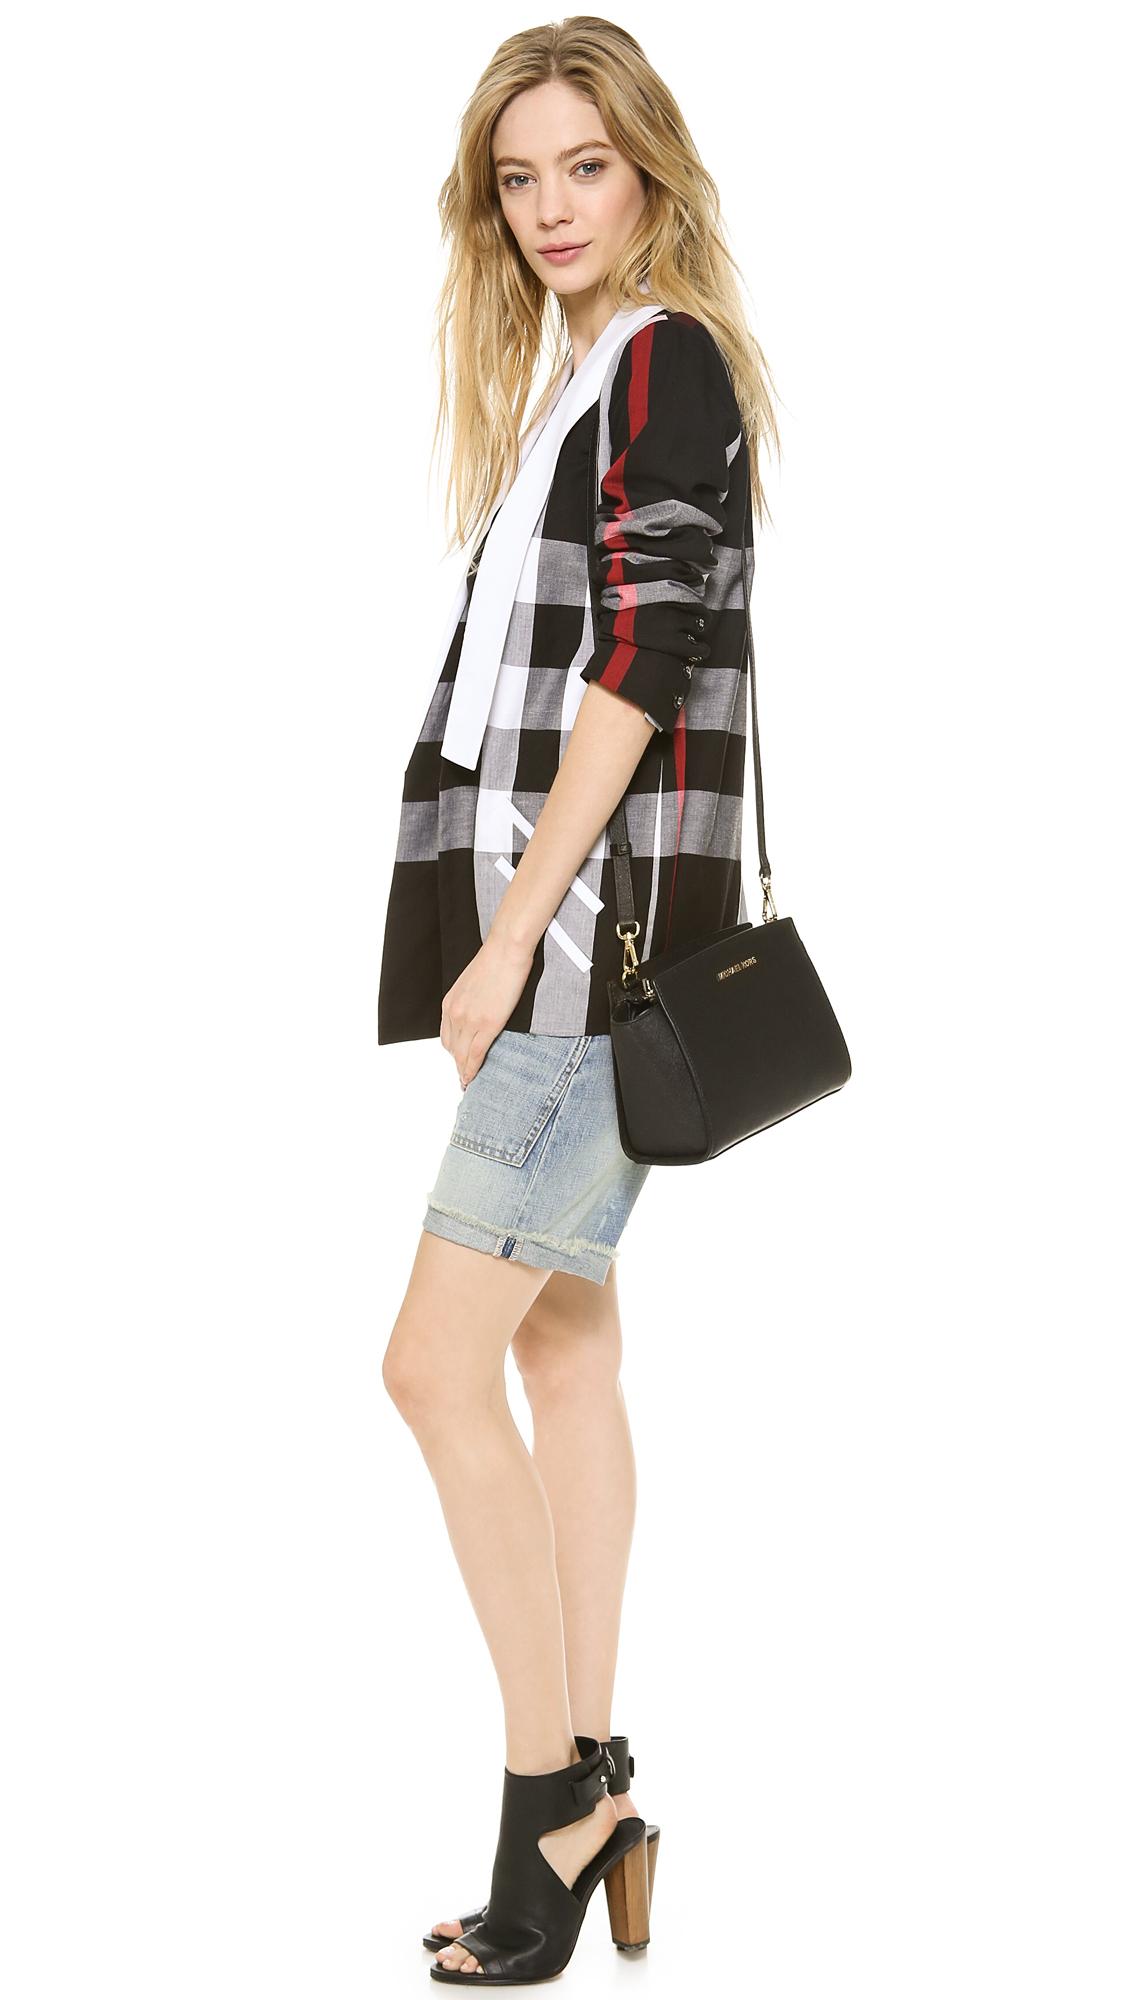 Michael Michael Kors Selma Medium Messenger Bag Shopbop